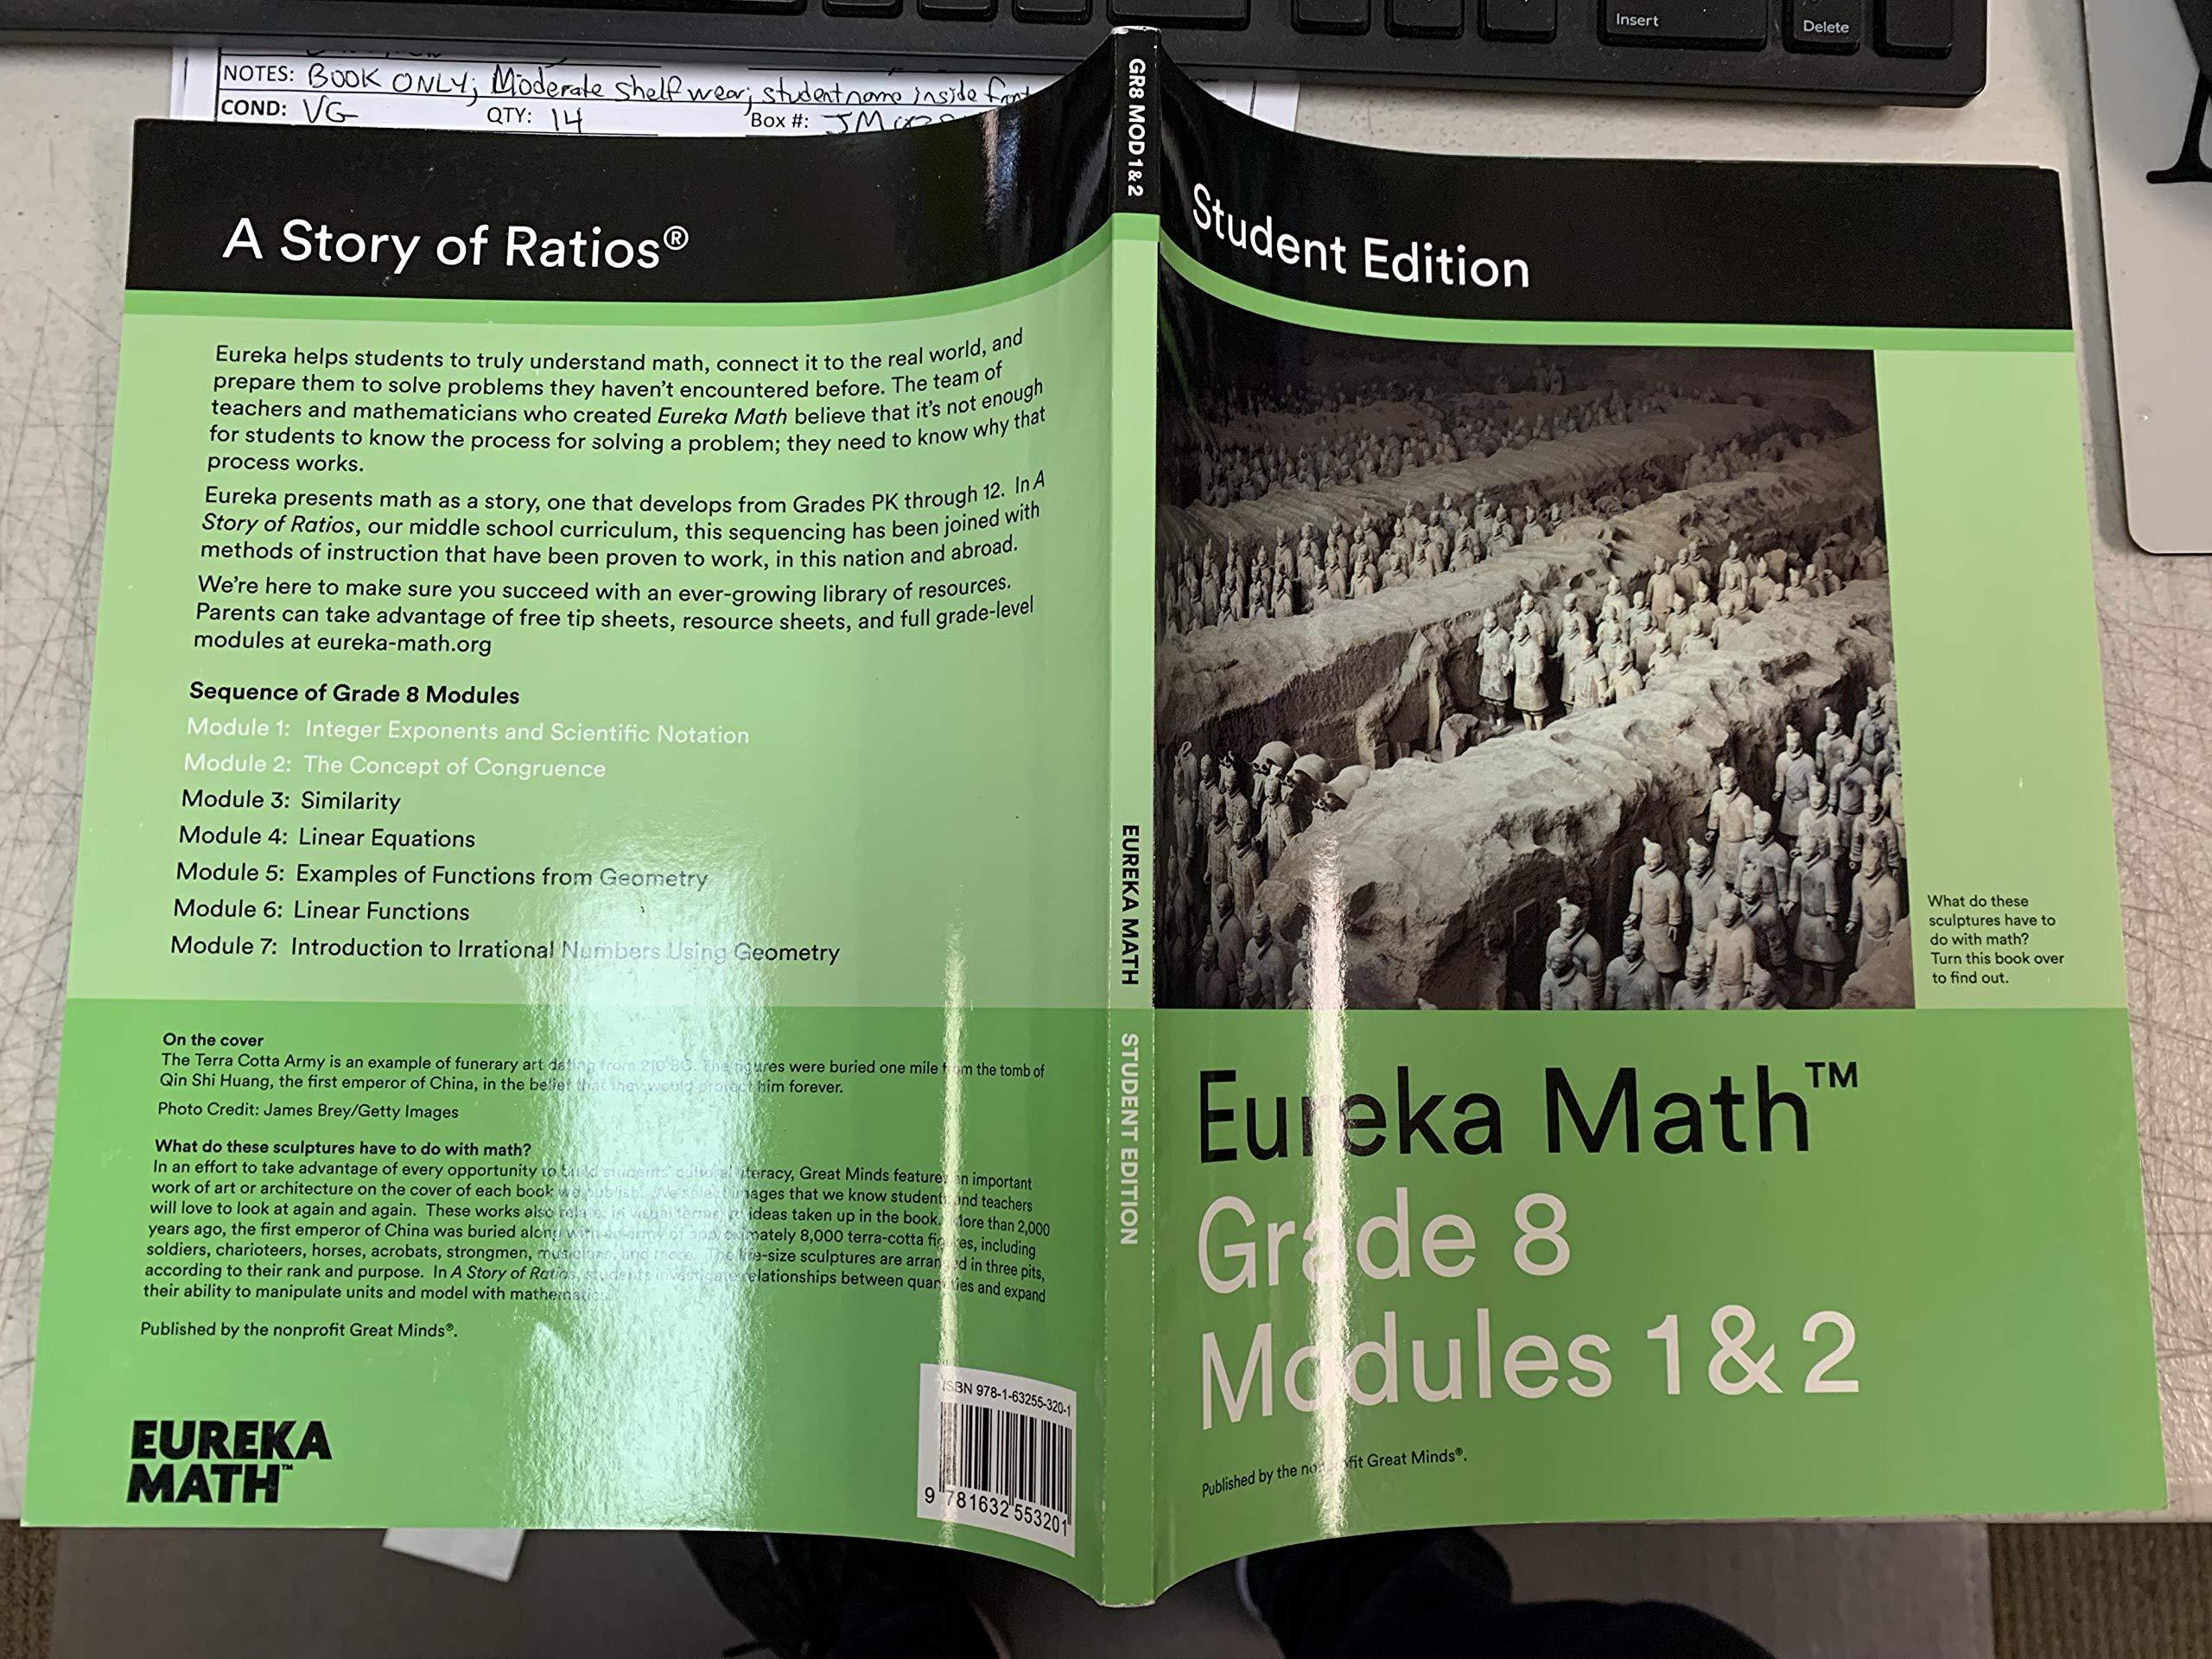 Eureka Math Grade 8 Modules 1 & 2 Integer Exponents and